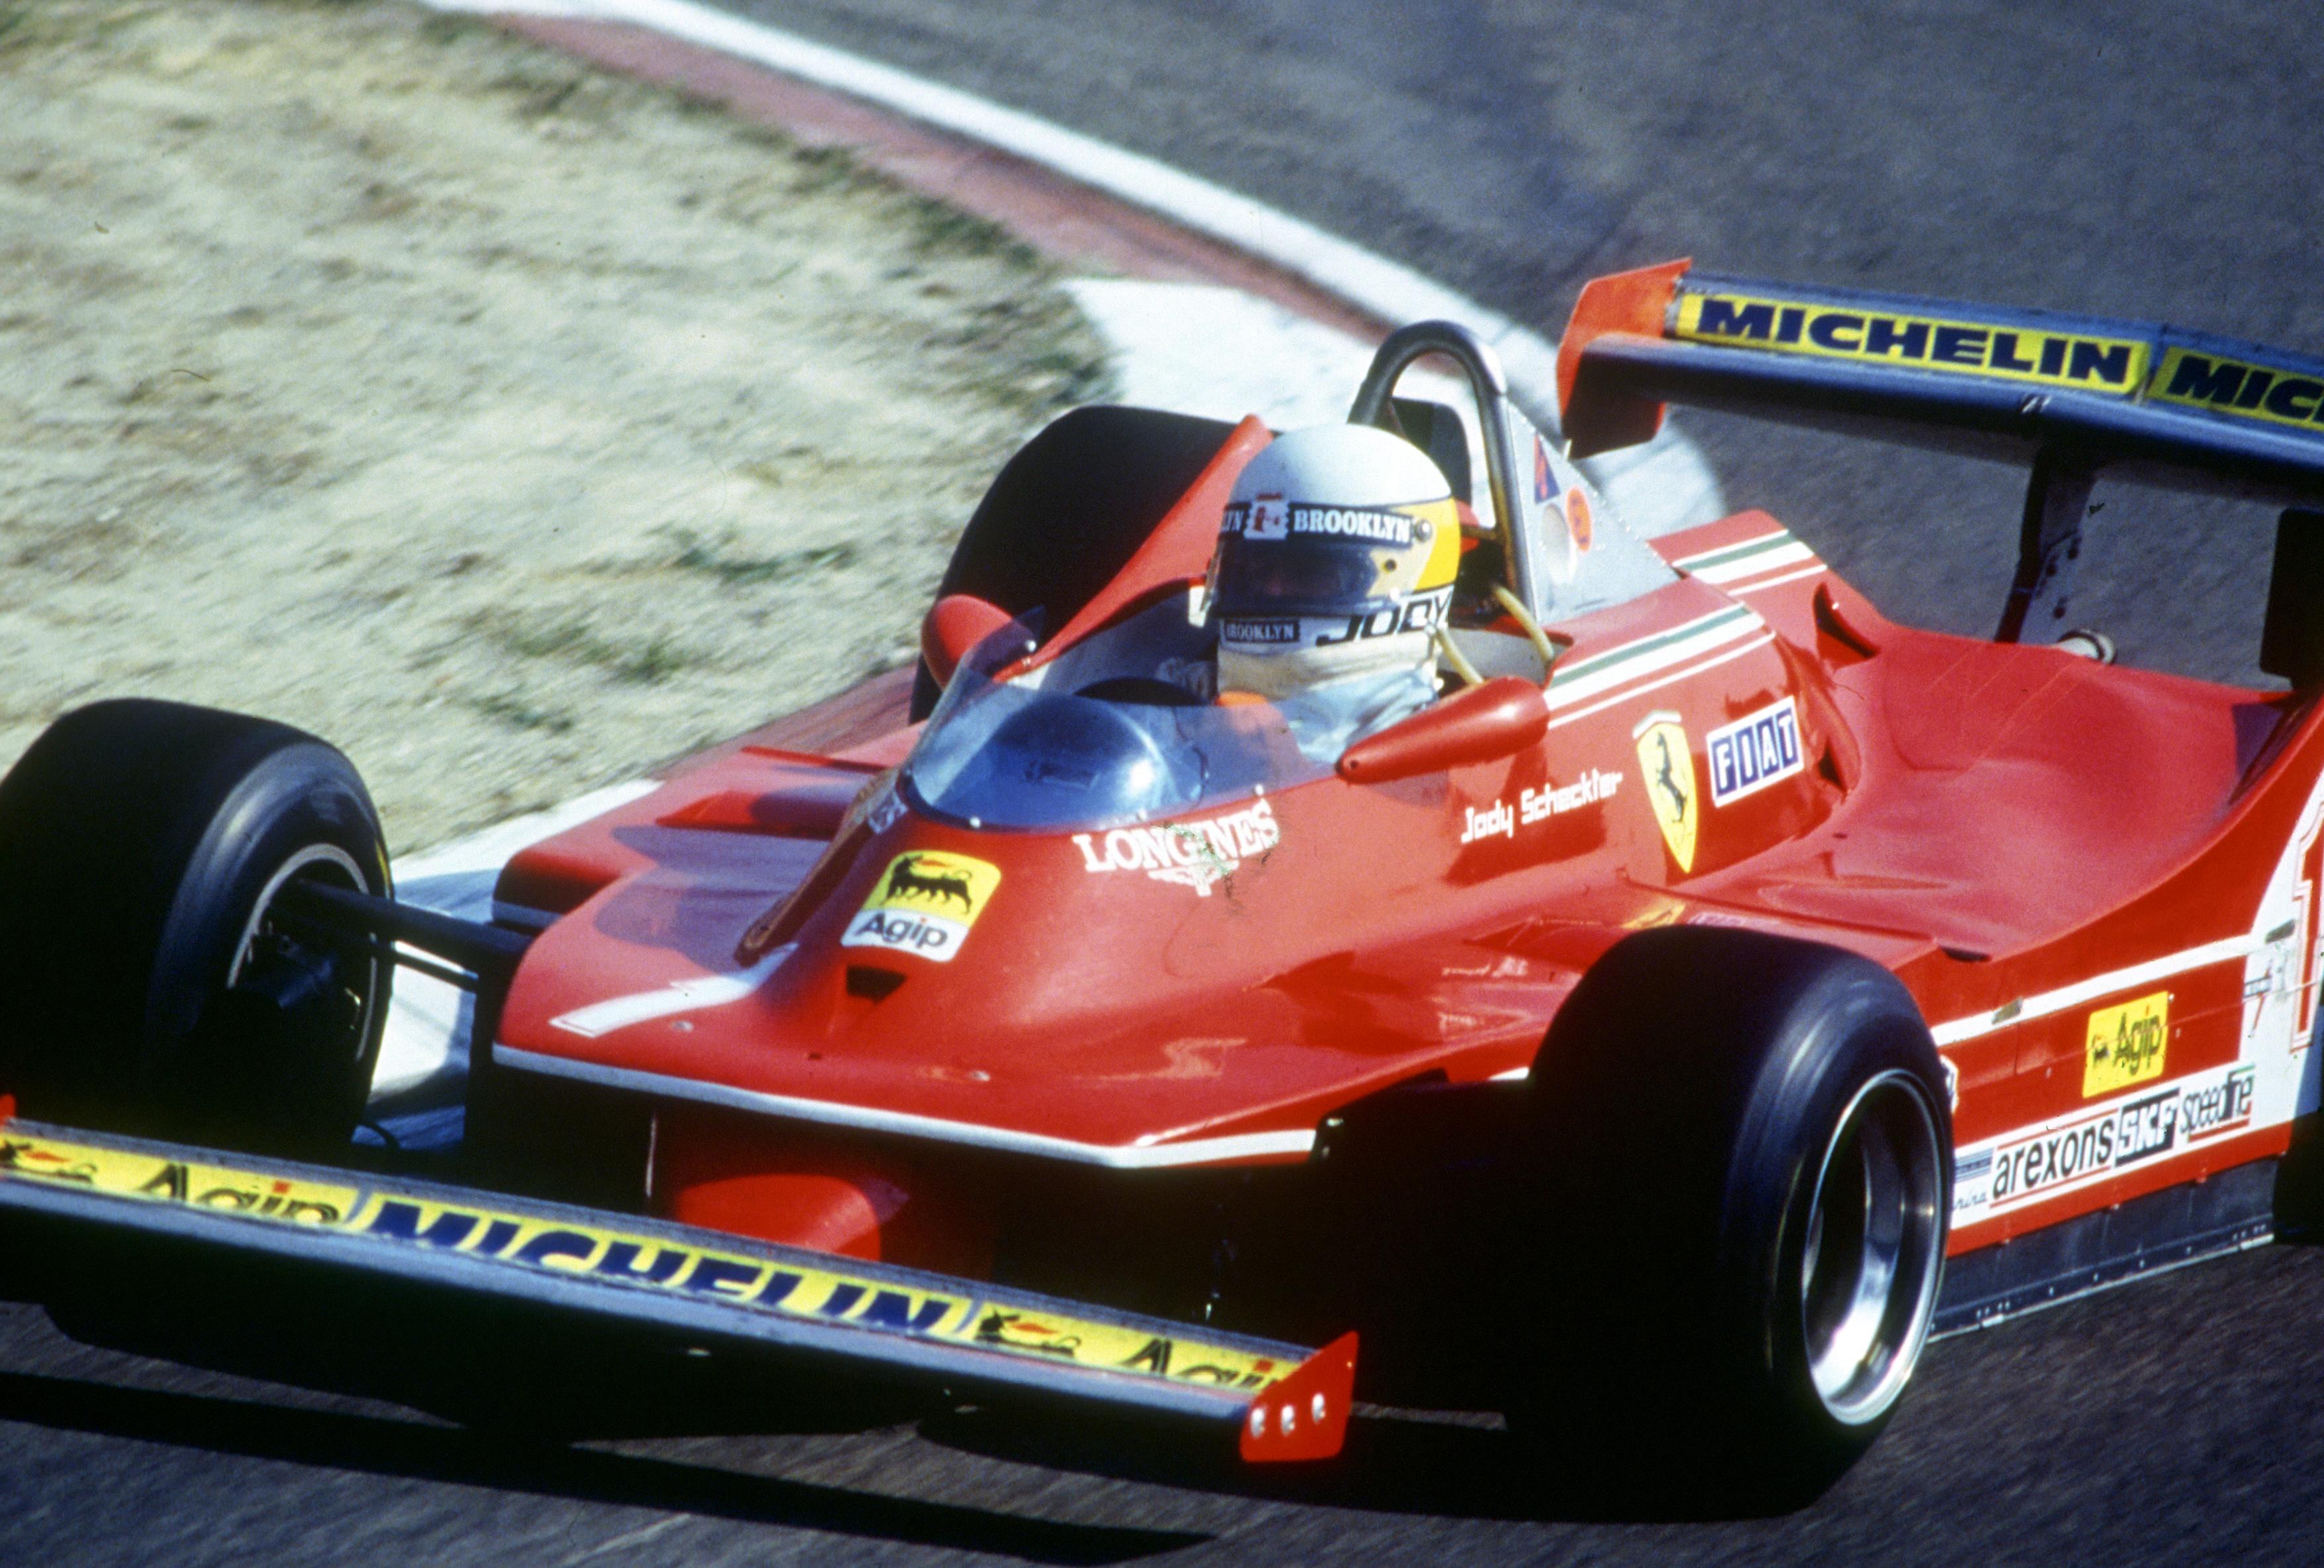 Italian Grand Prix Imola (ita) 12 14 09 1980